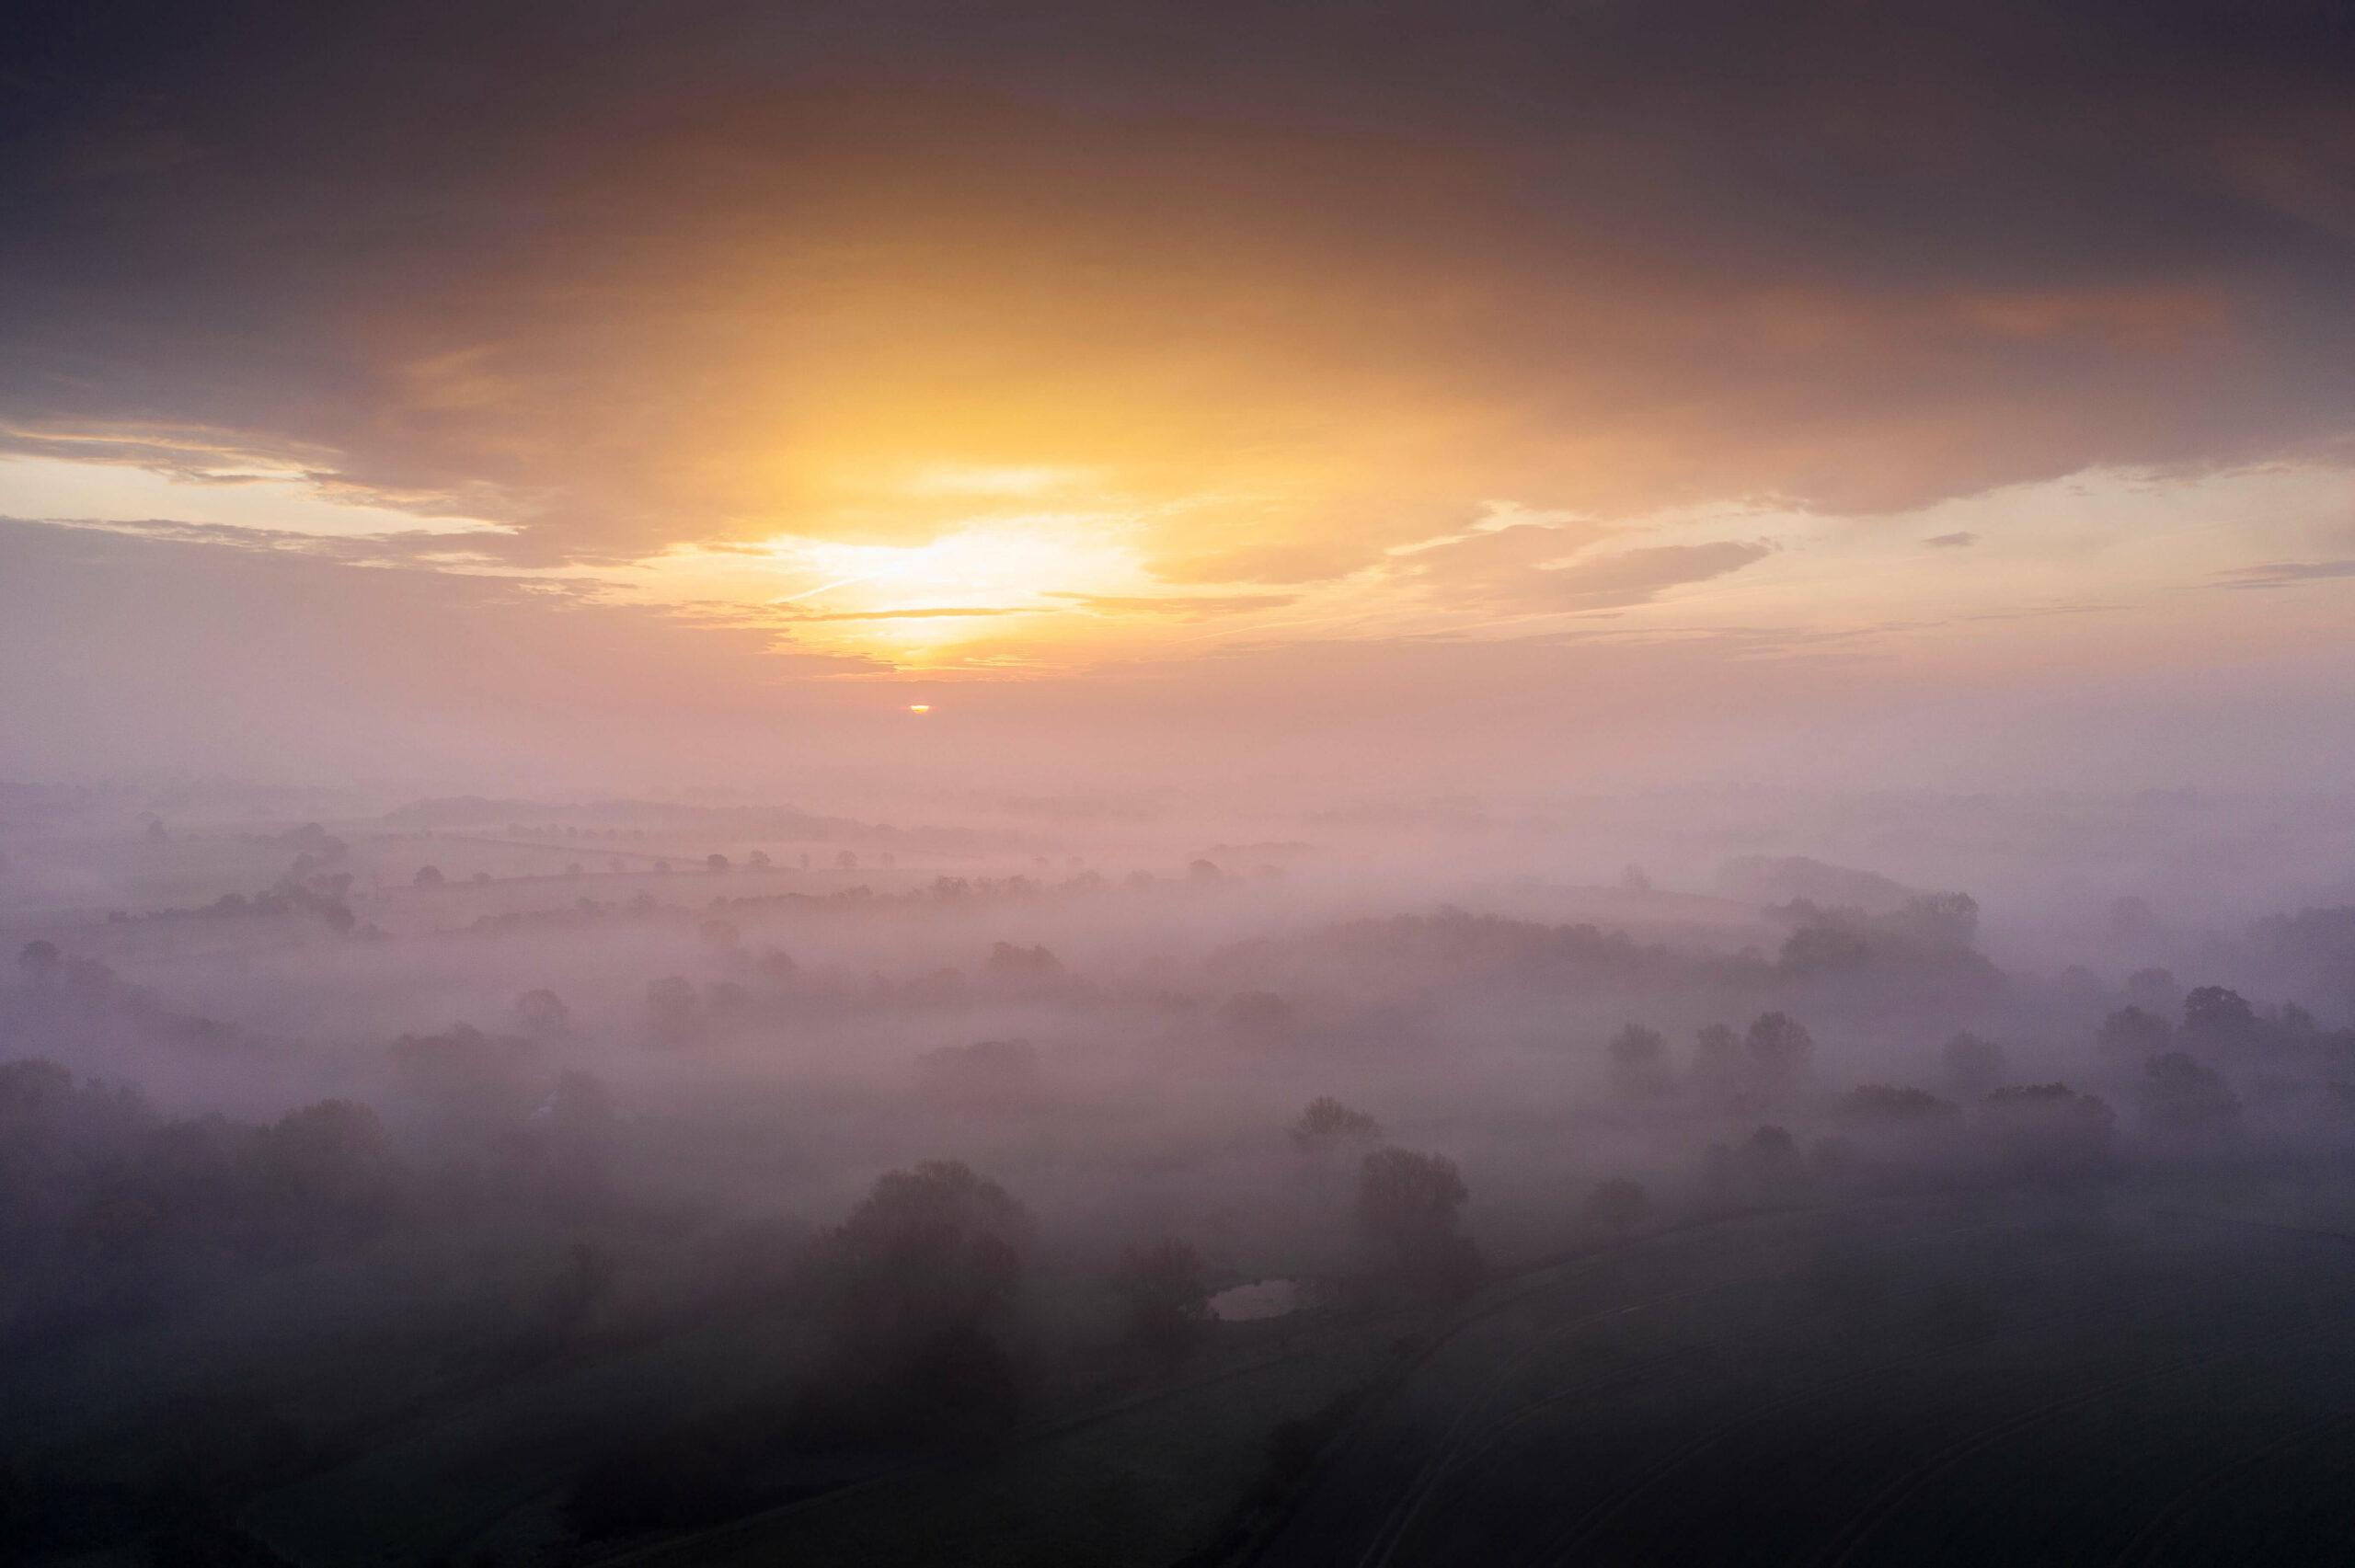 Sunrise over the Fynn Valley, Suffolk